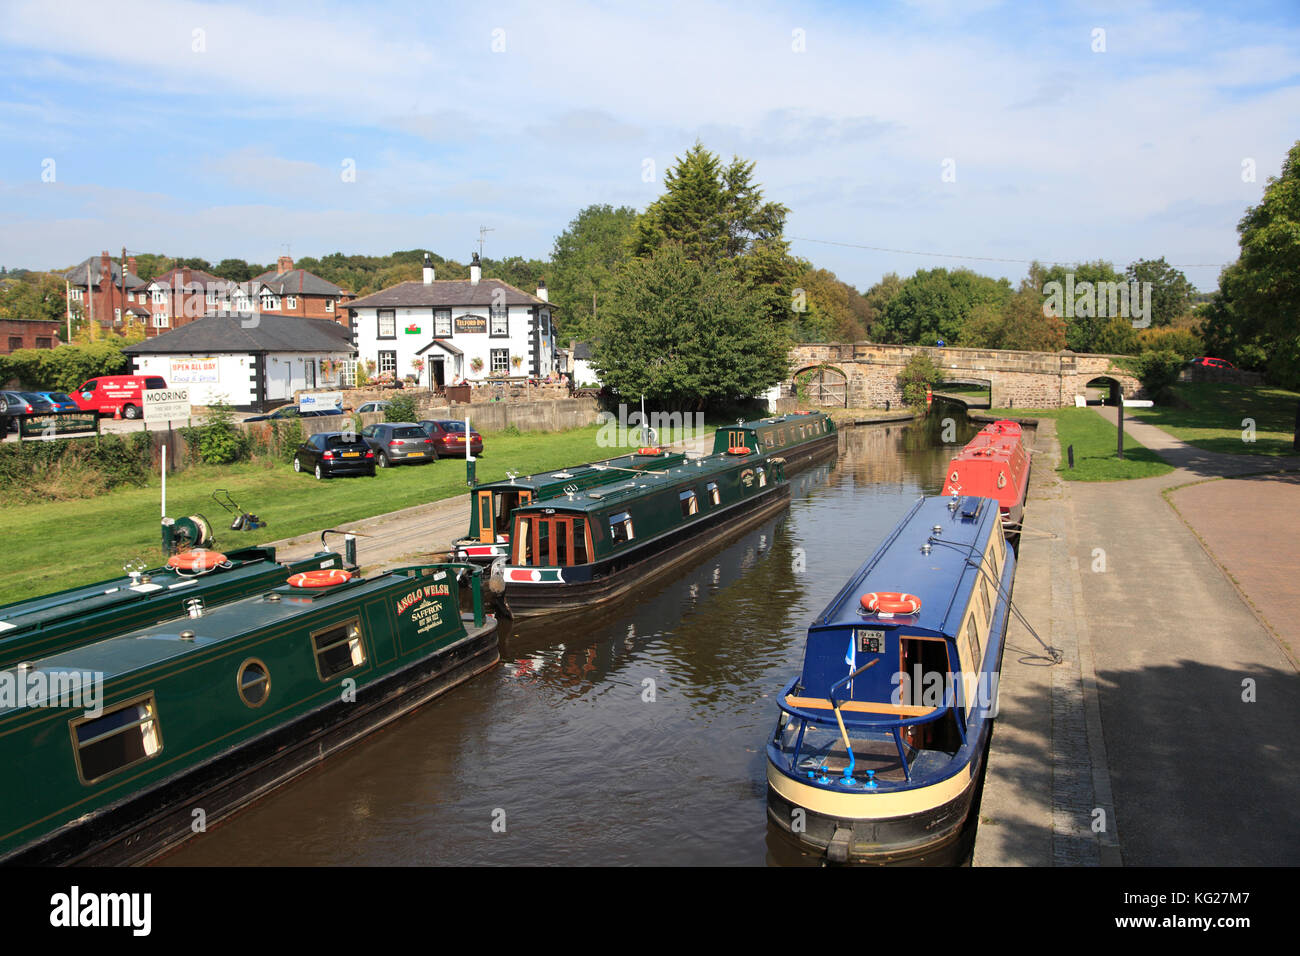 Narrow Boats, Pontcysyllte Canal, Llangollen, Dee Valley, Denbighshire, North Wales, Wales, United Kingdom, Europe - Stock Image